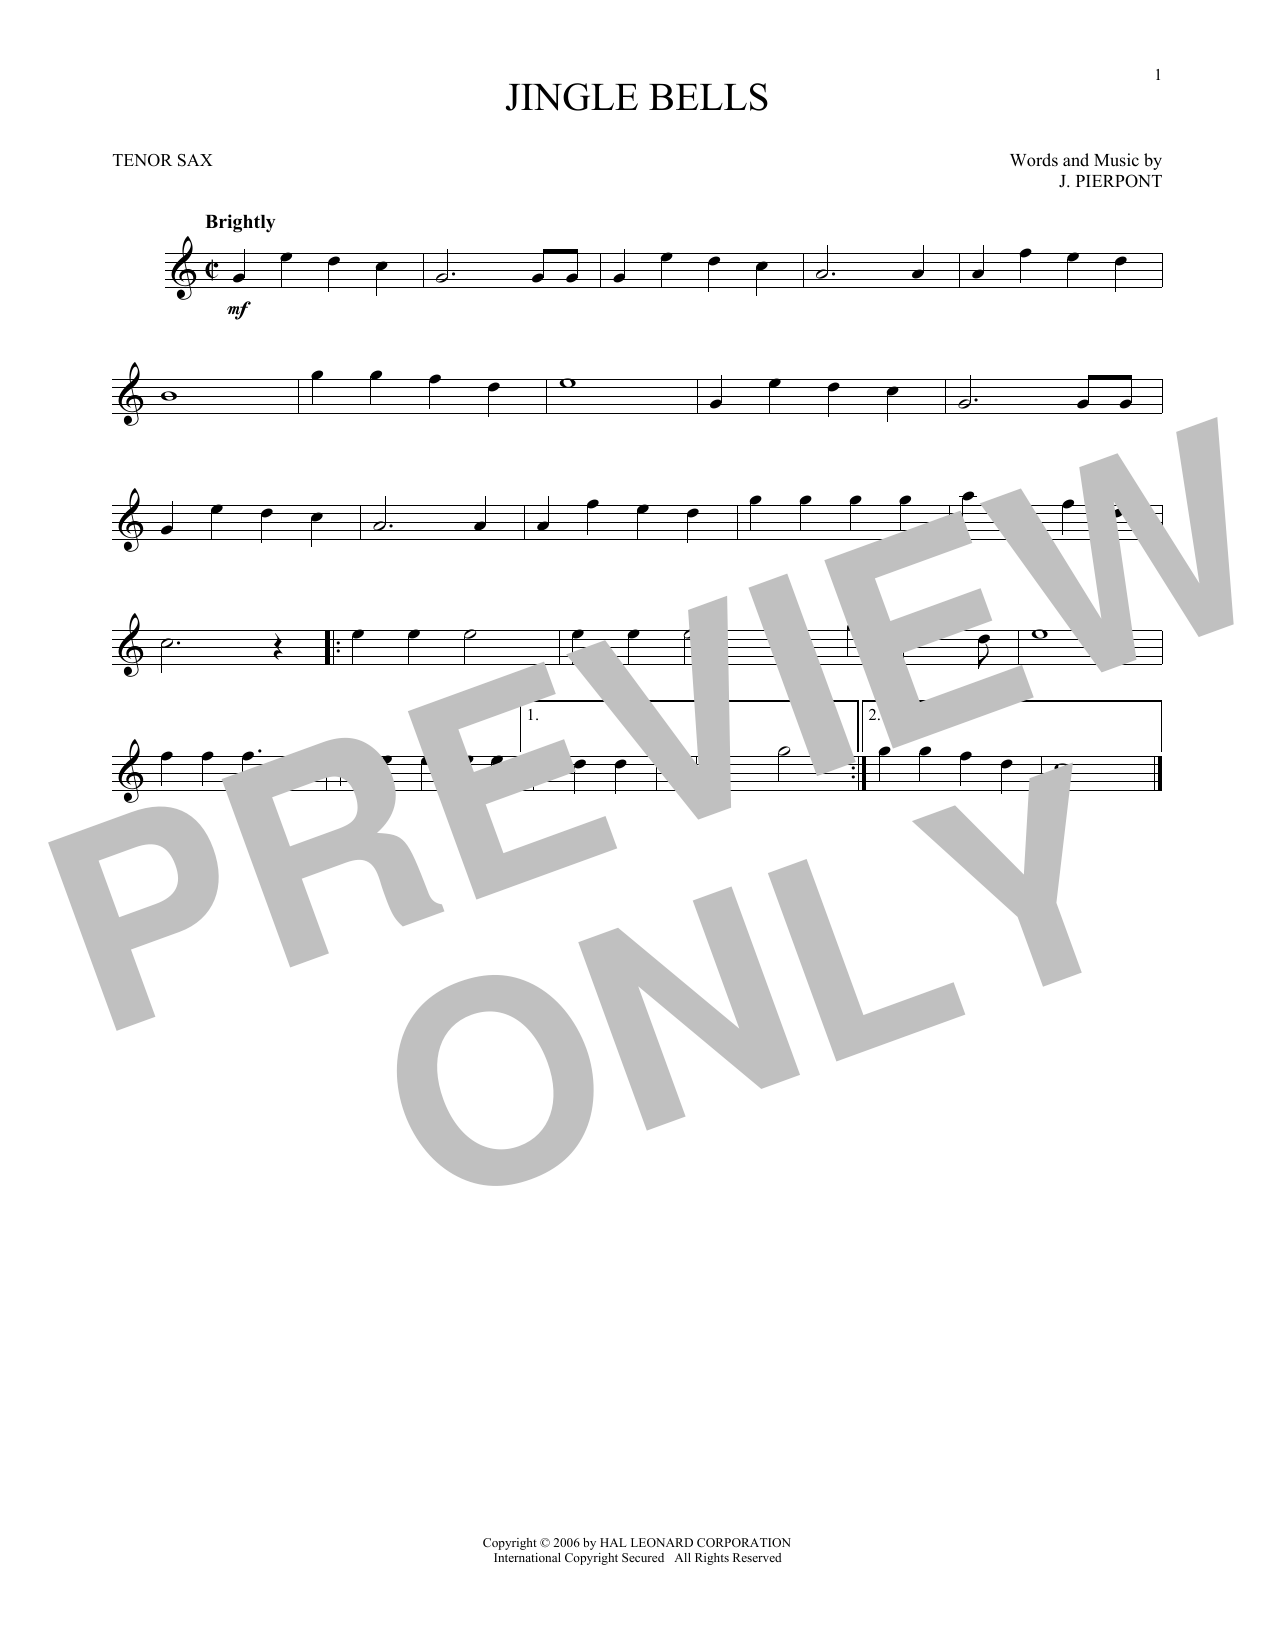 Jingle Bells (Tenor Sax Solo)